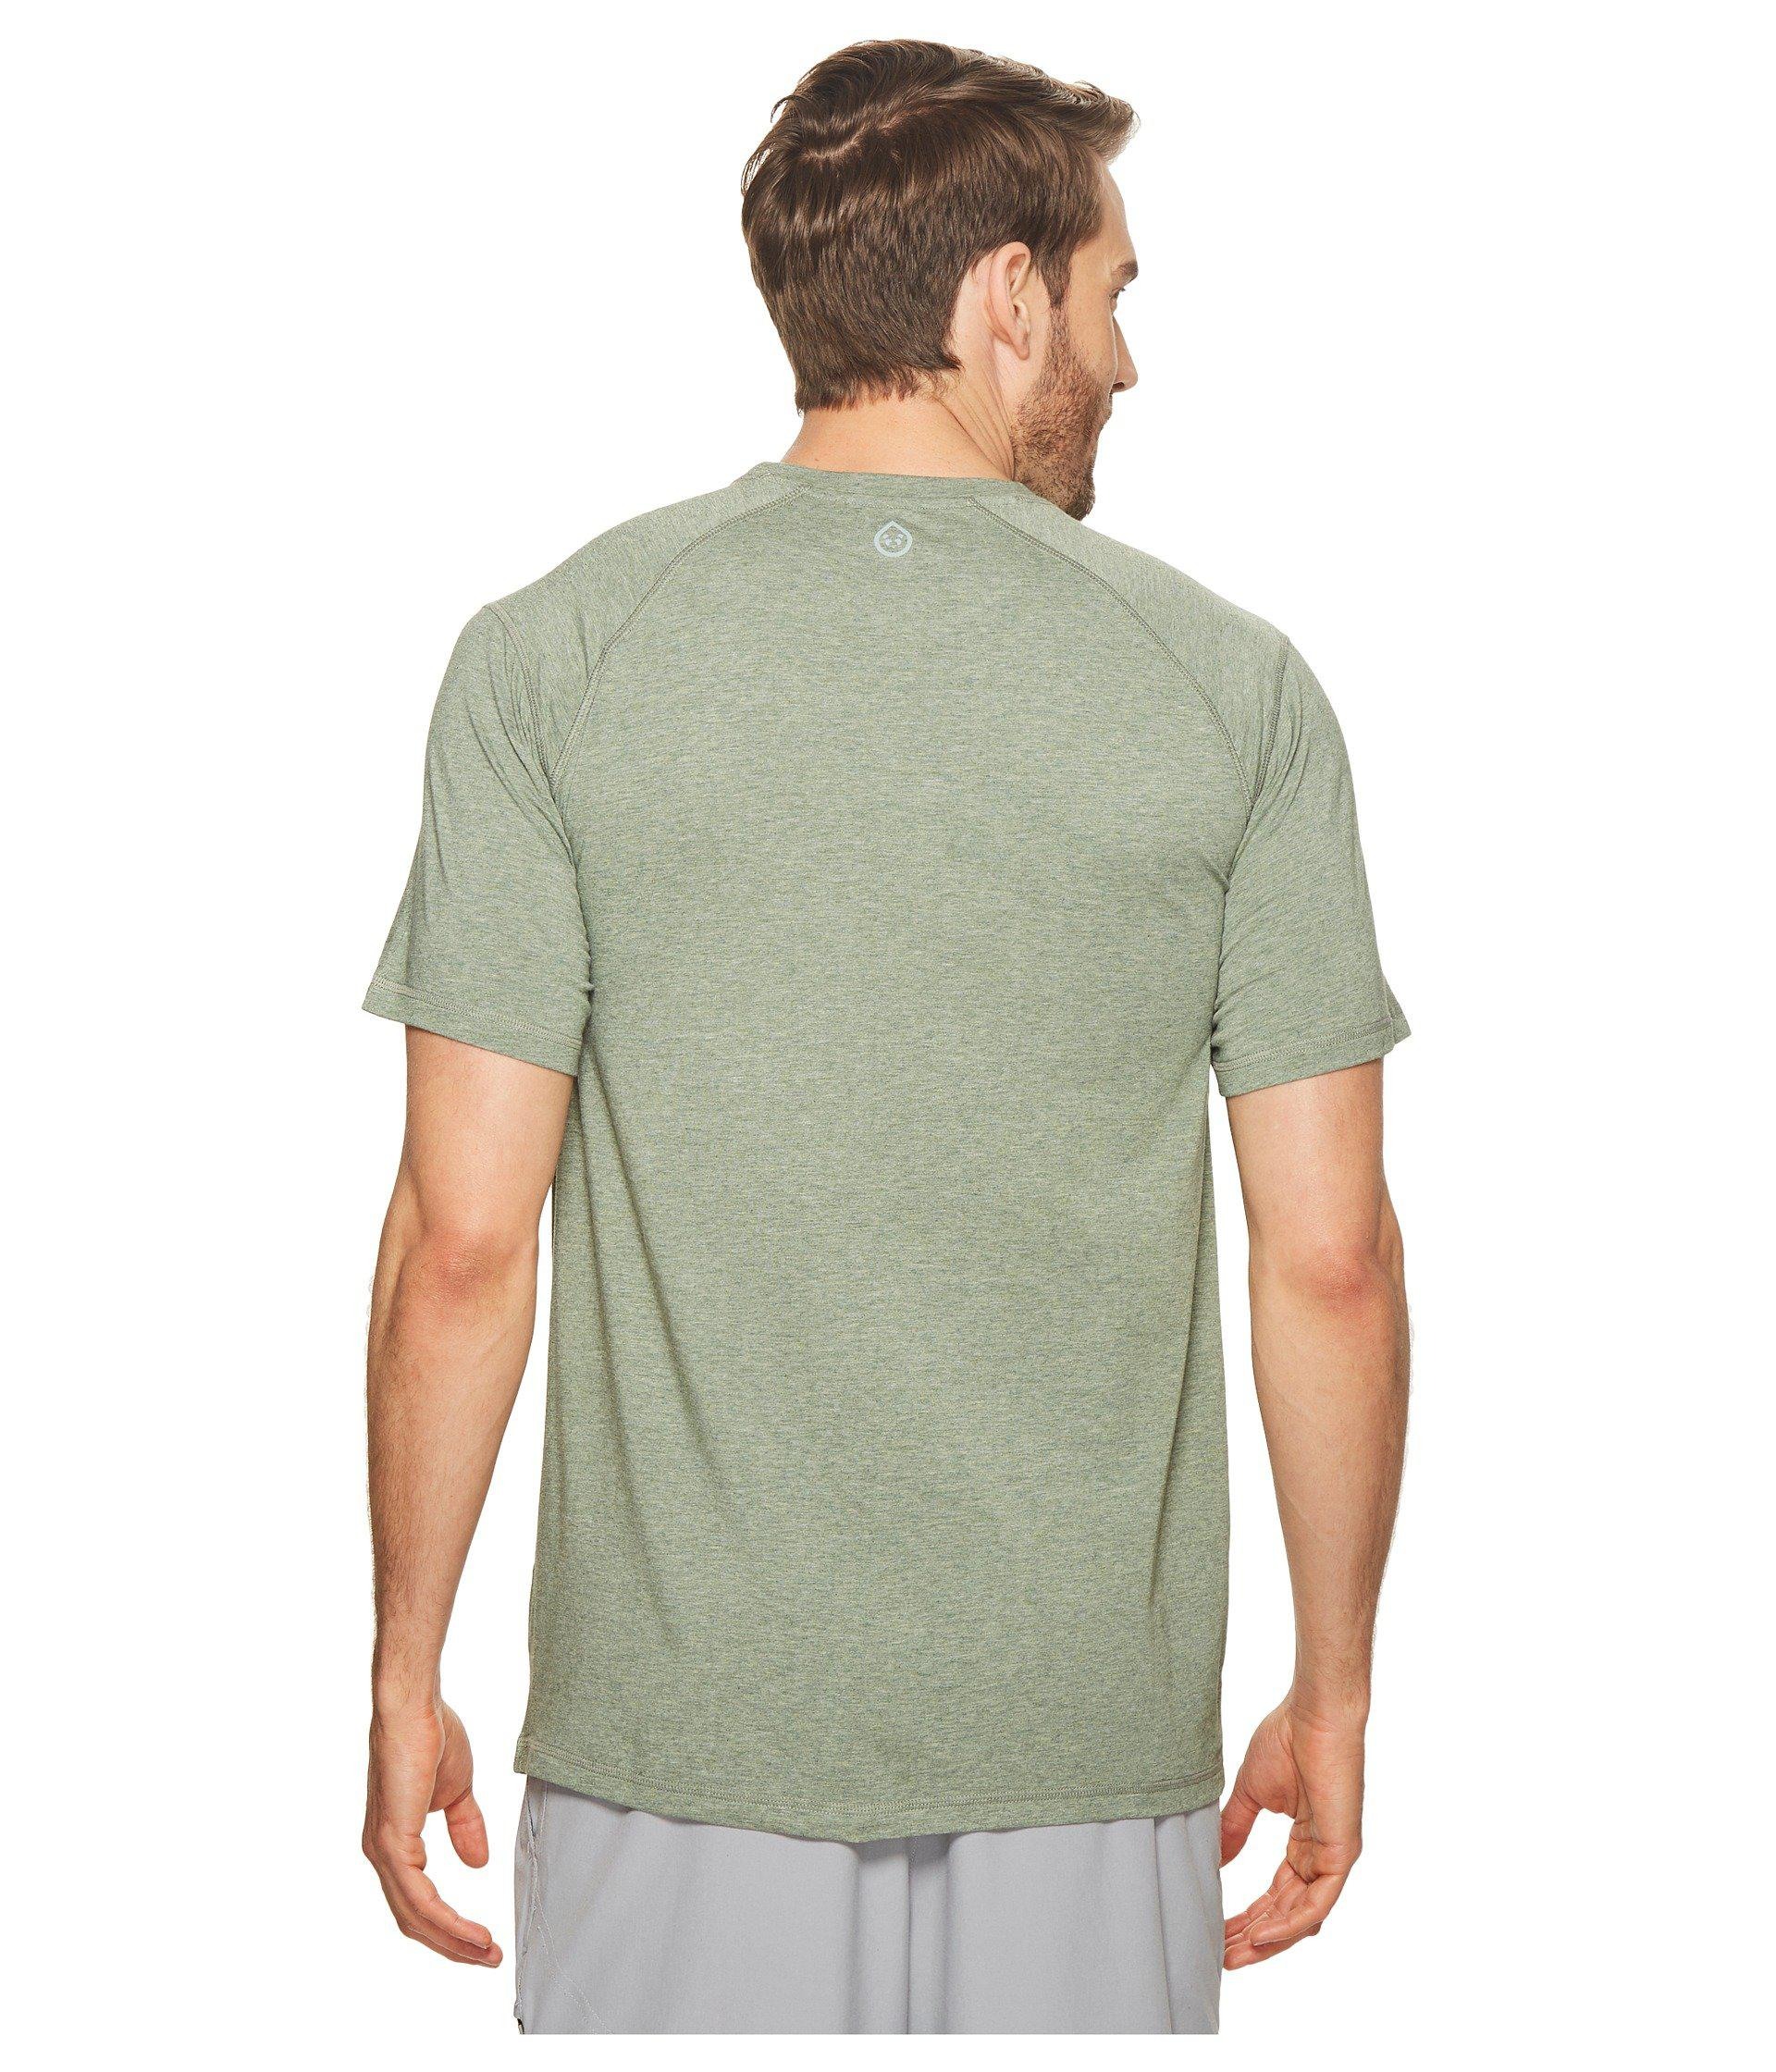 Lyst - Tasc Performance Carrollton Top in Green for Men